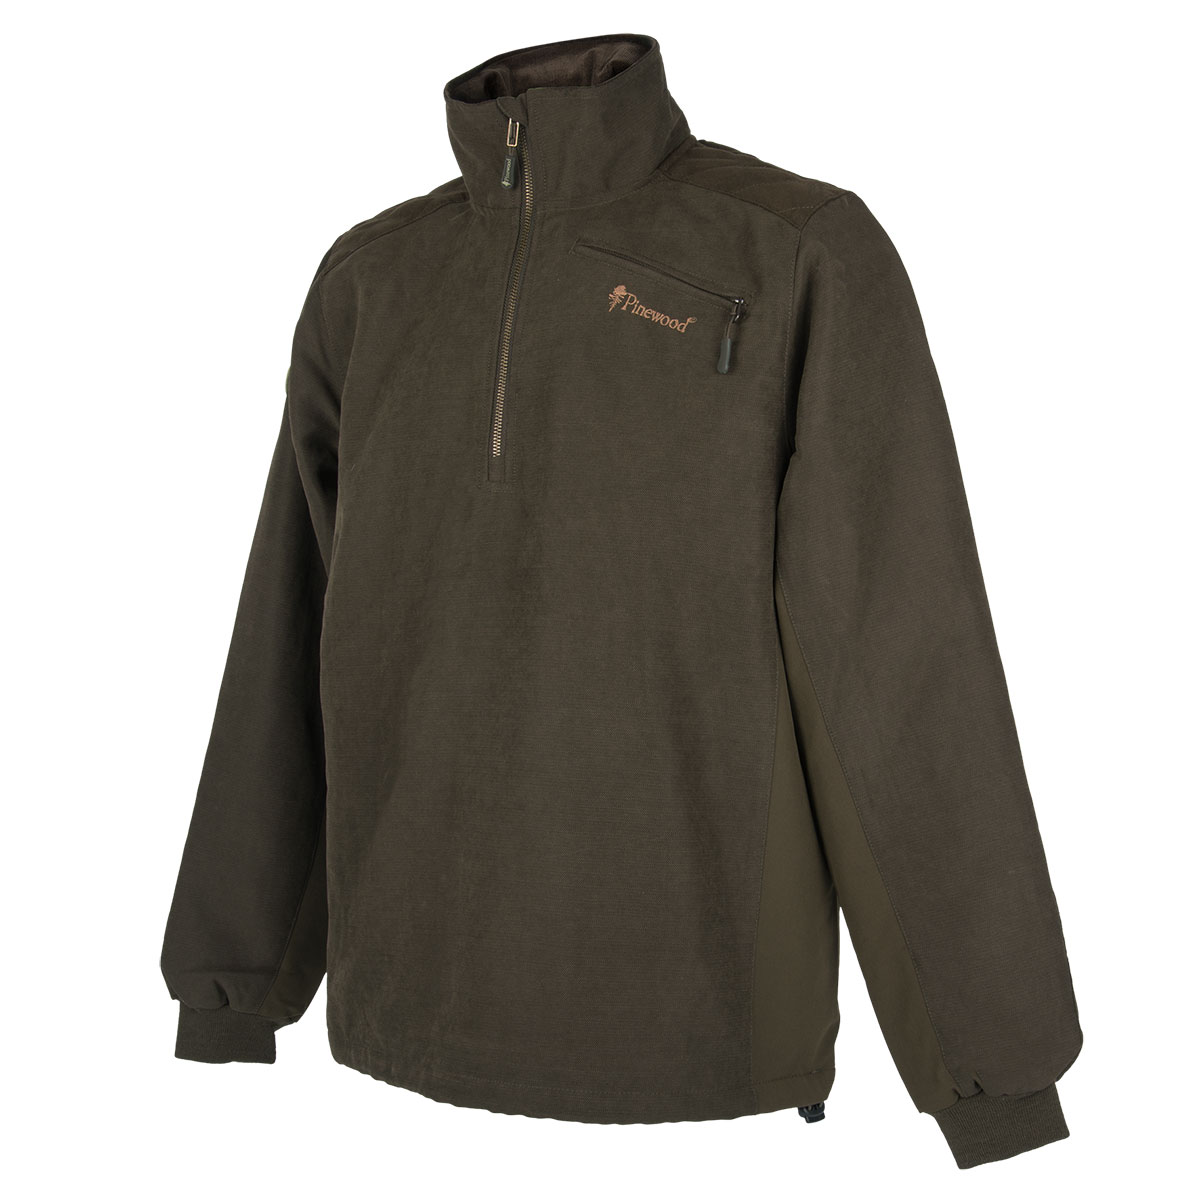 Pinewood Sweater Prestwick Suede Wildlederbraun im Pareyshop